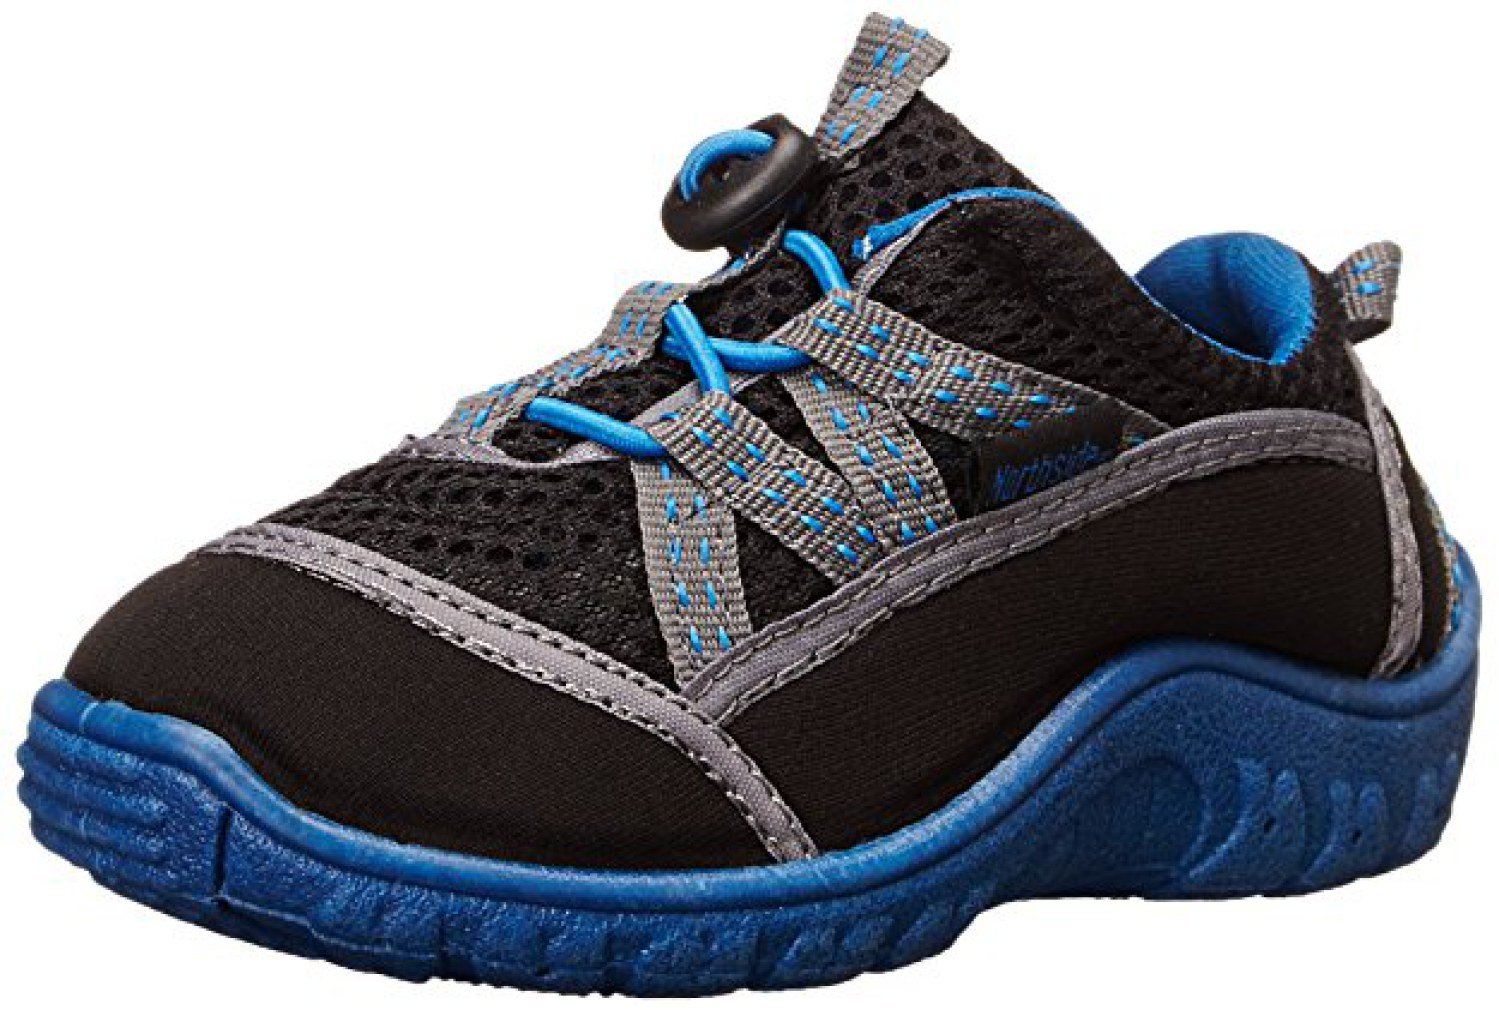 Northside Kid's Brille II Summer Water Shoe, Black/Blue, 6 M US Toddler; with a Waterproof Wet Dry Bag